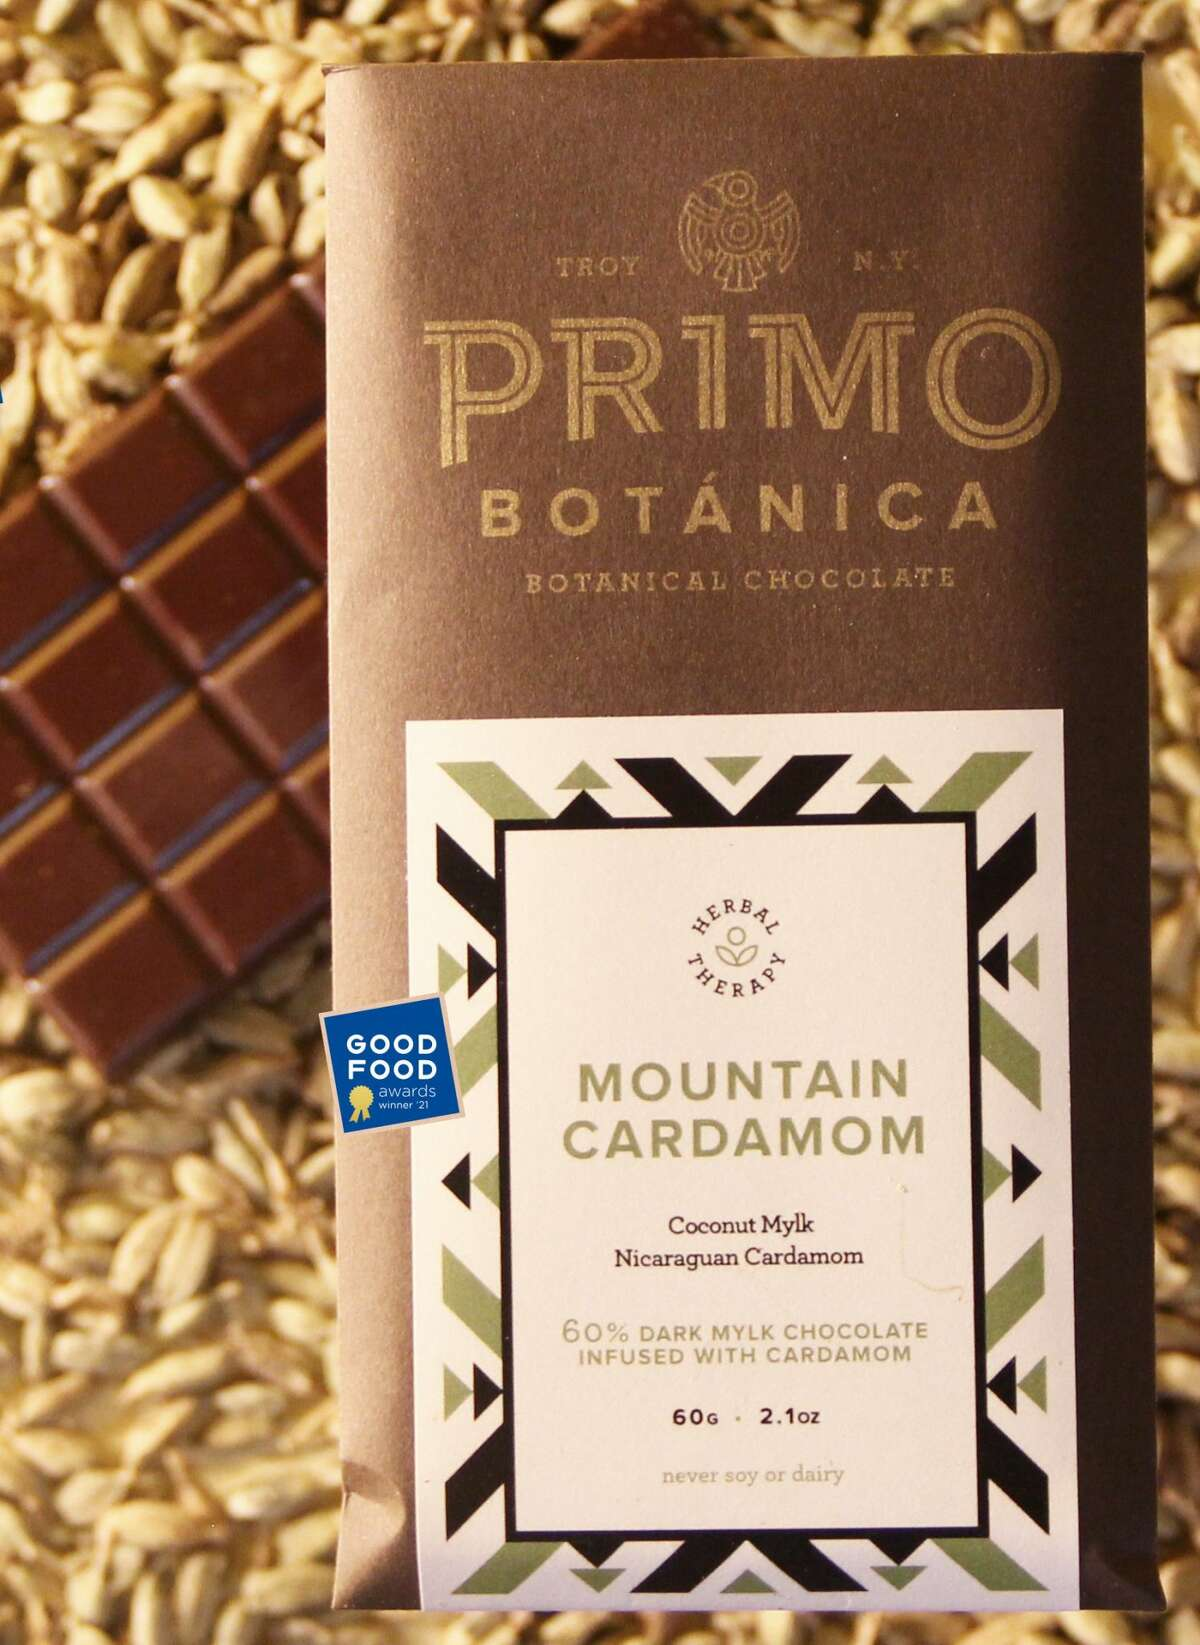 Primo Botanica's award-winning Mountain Cardamom chocolate bar. (Provided photo.)